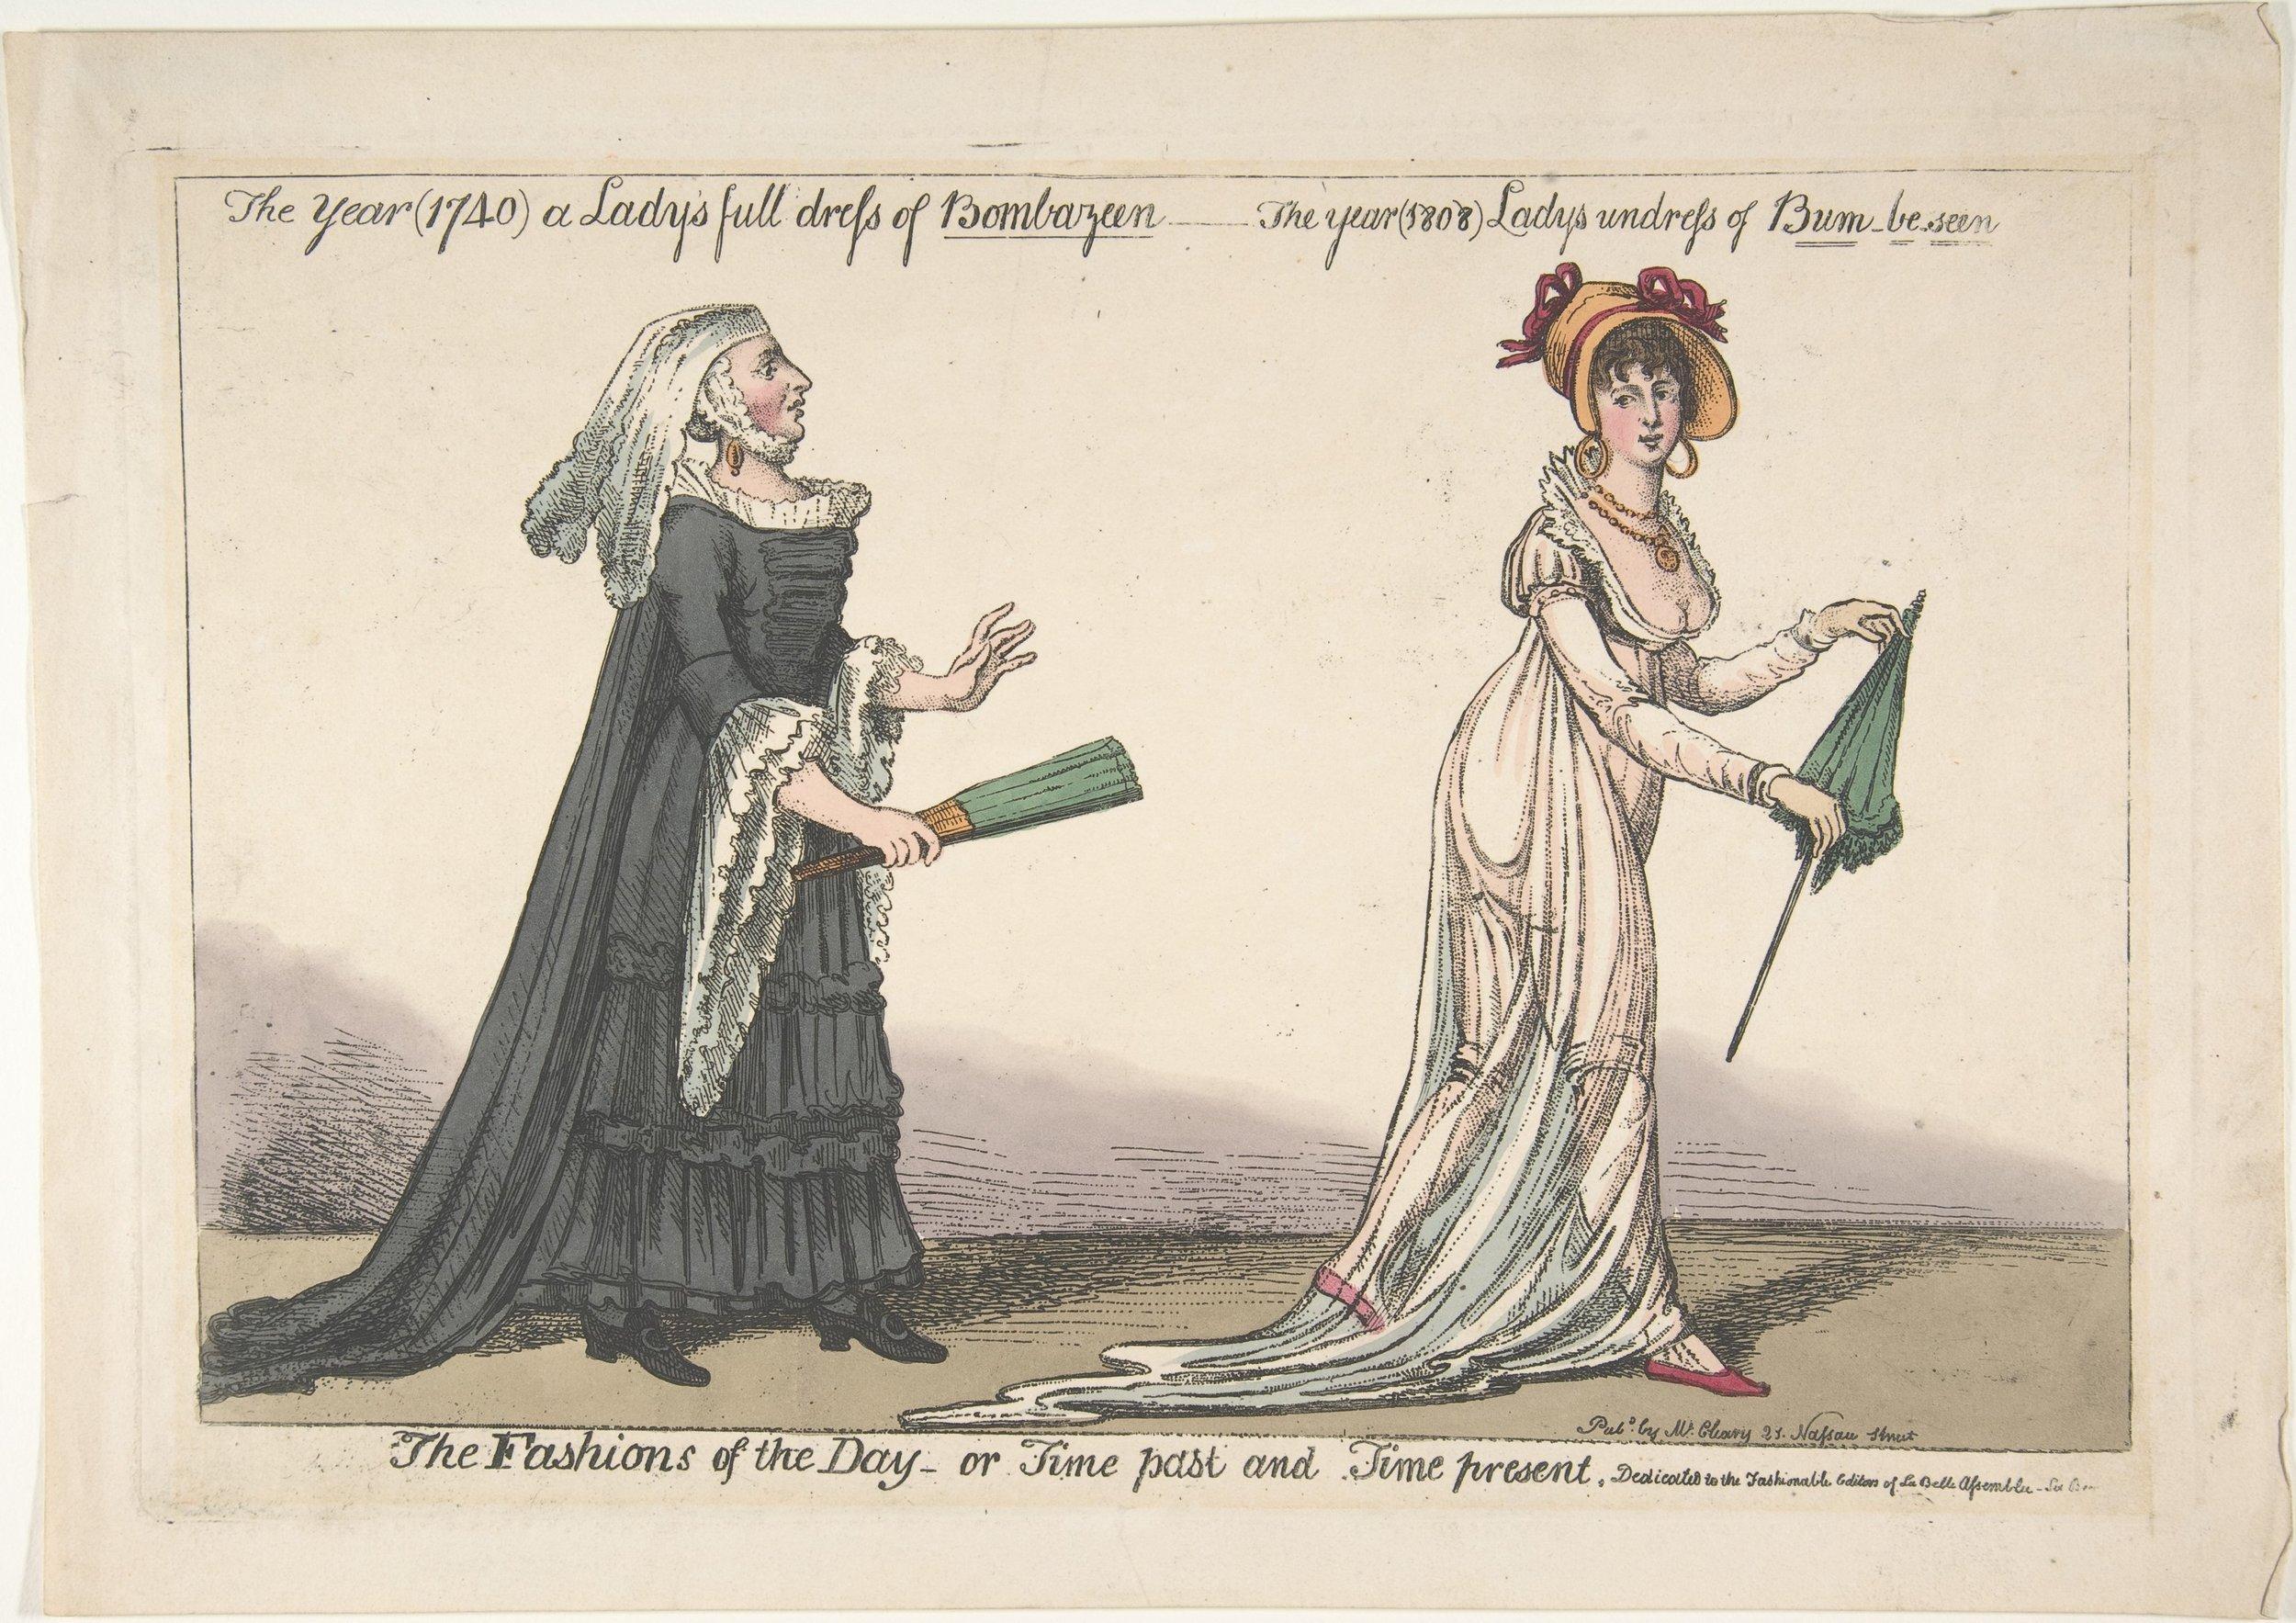 fashion, angry lady, regency lady, clothing